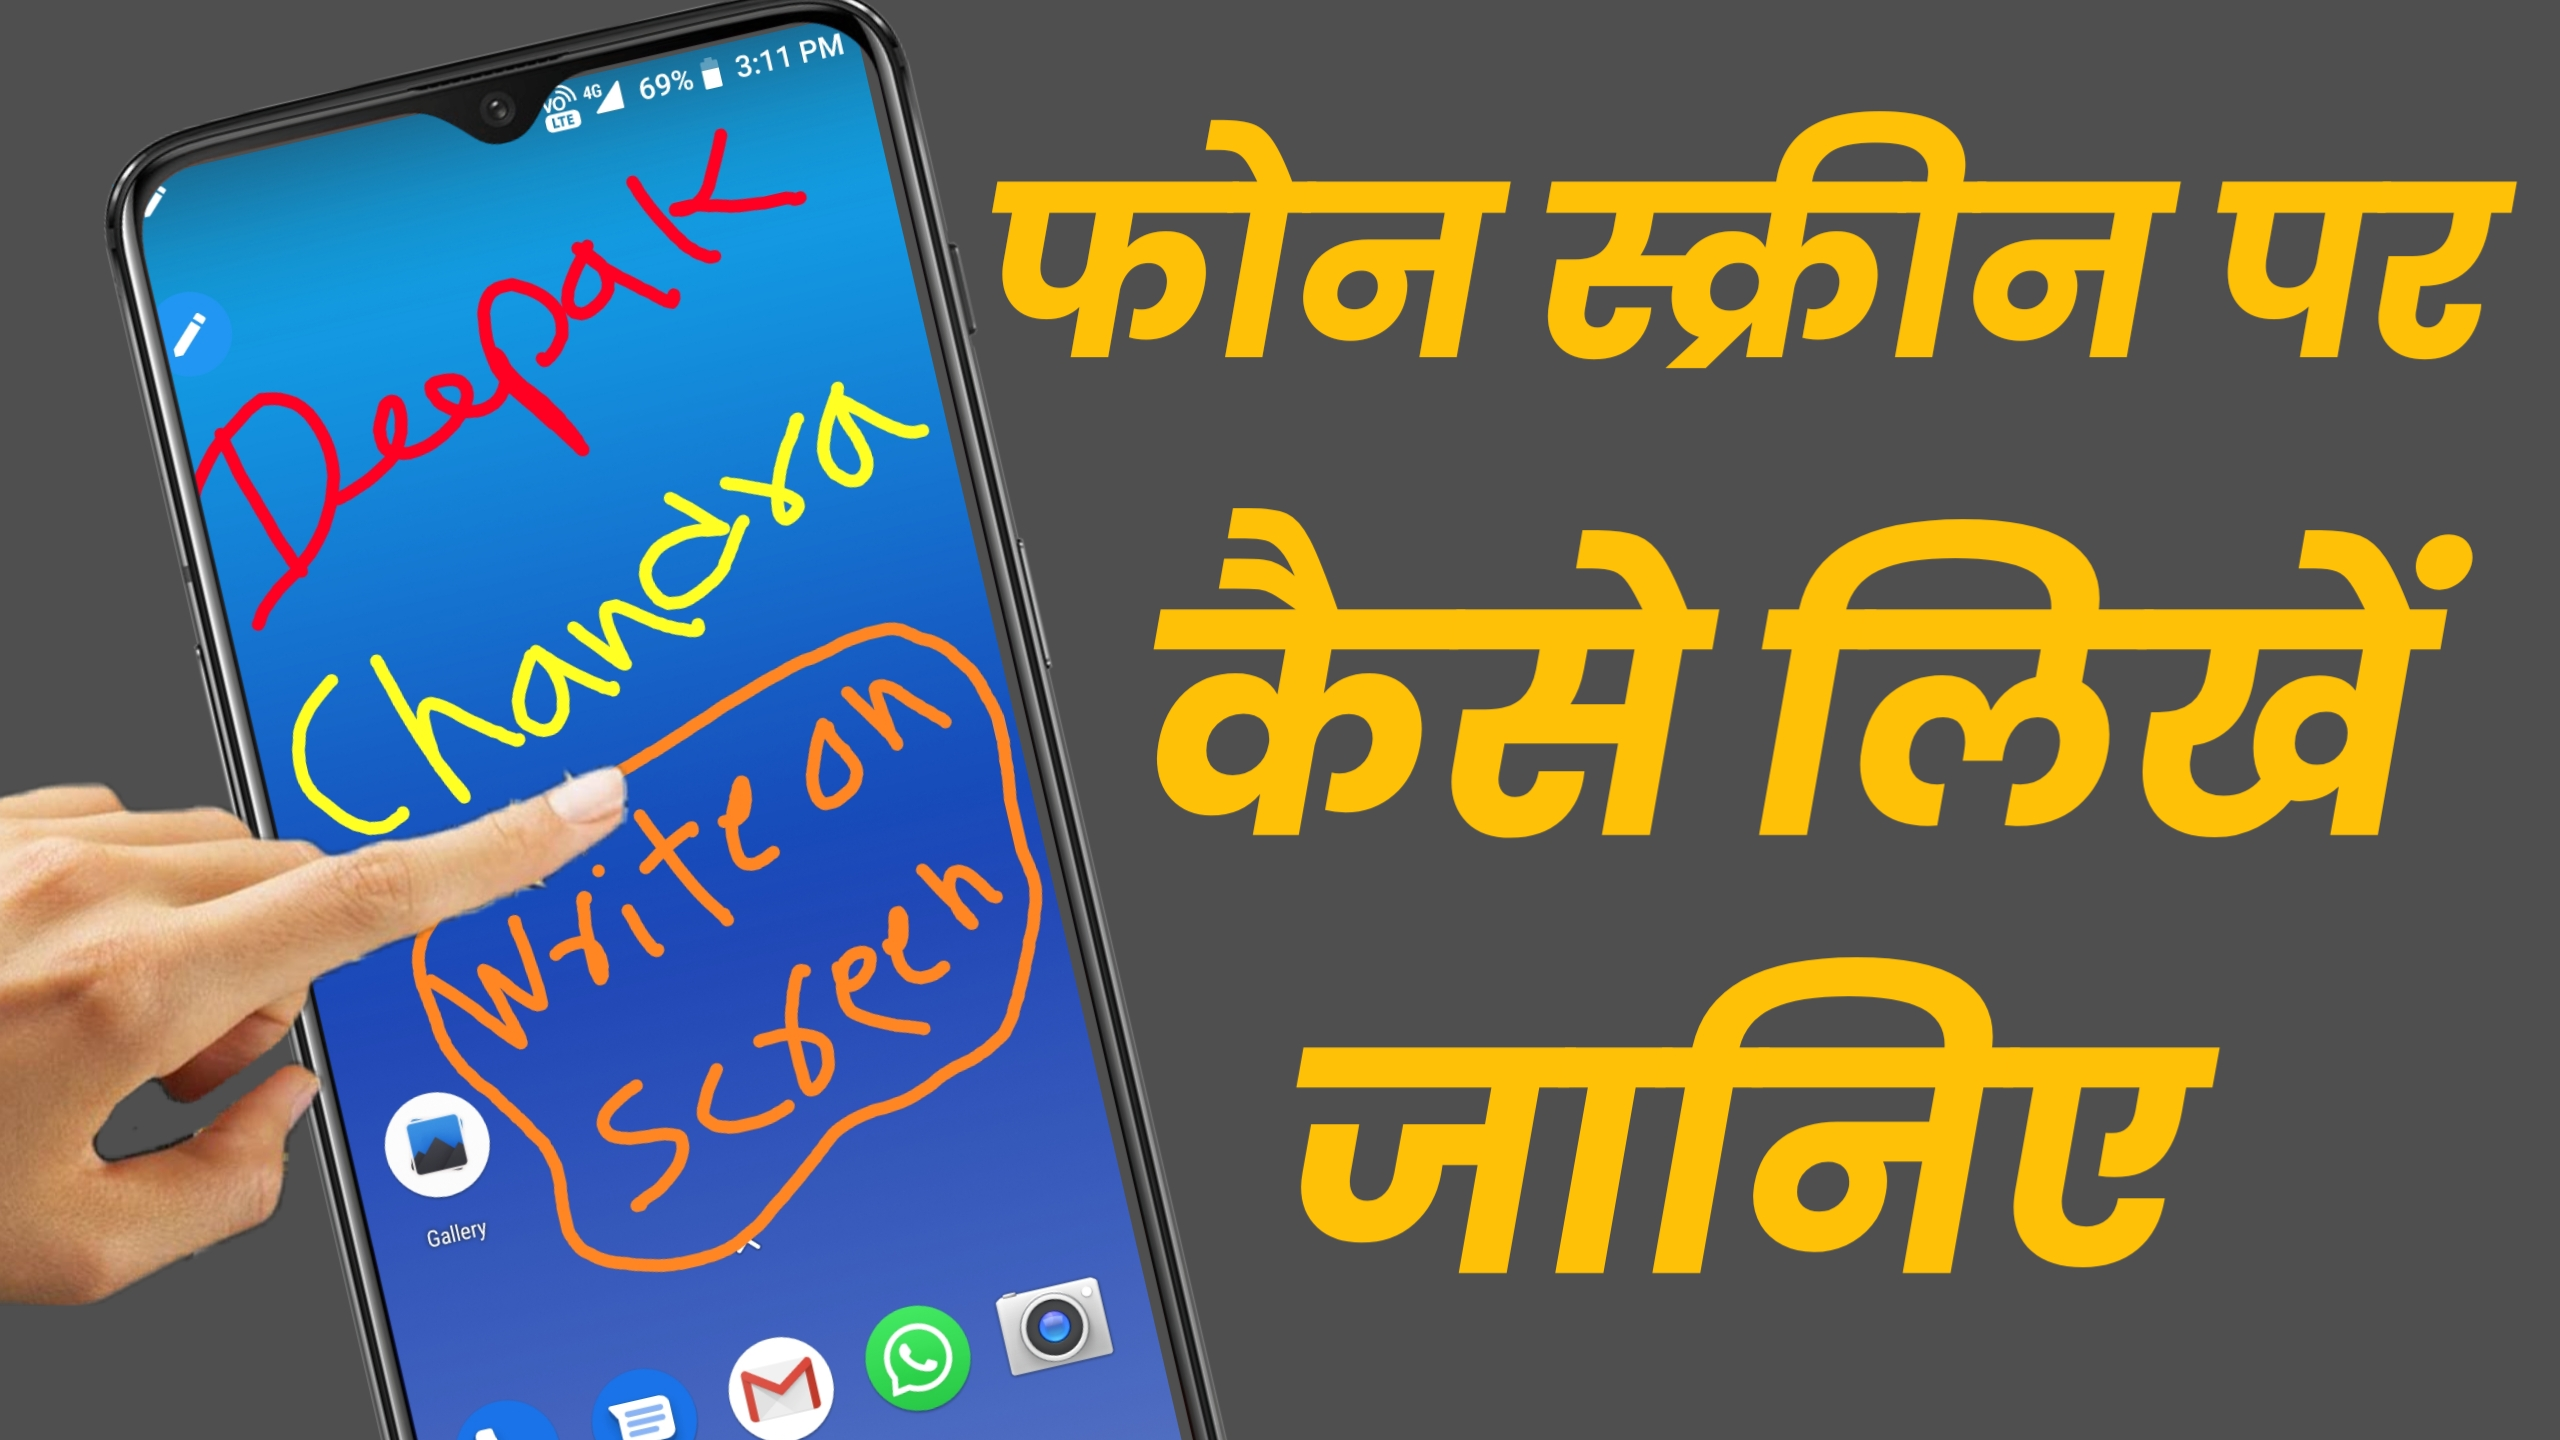 How To Write On Phone Screen Draw On Screen Dk Tech Hindi